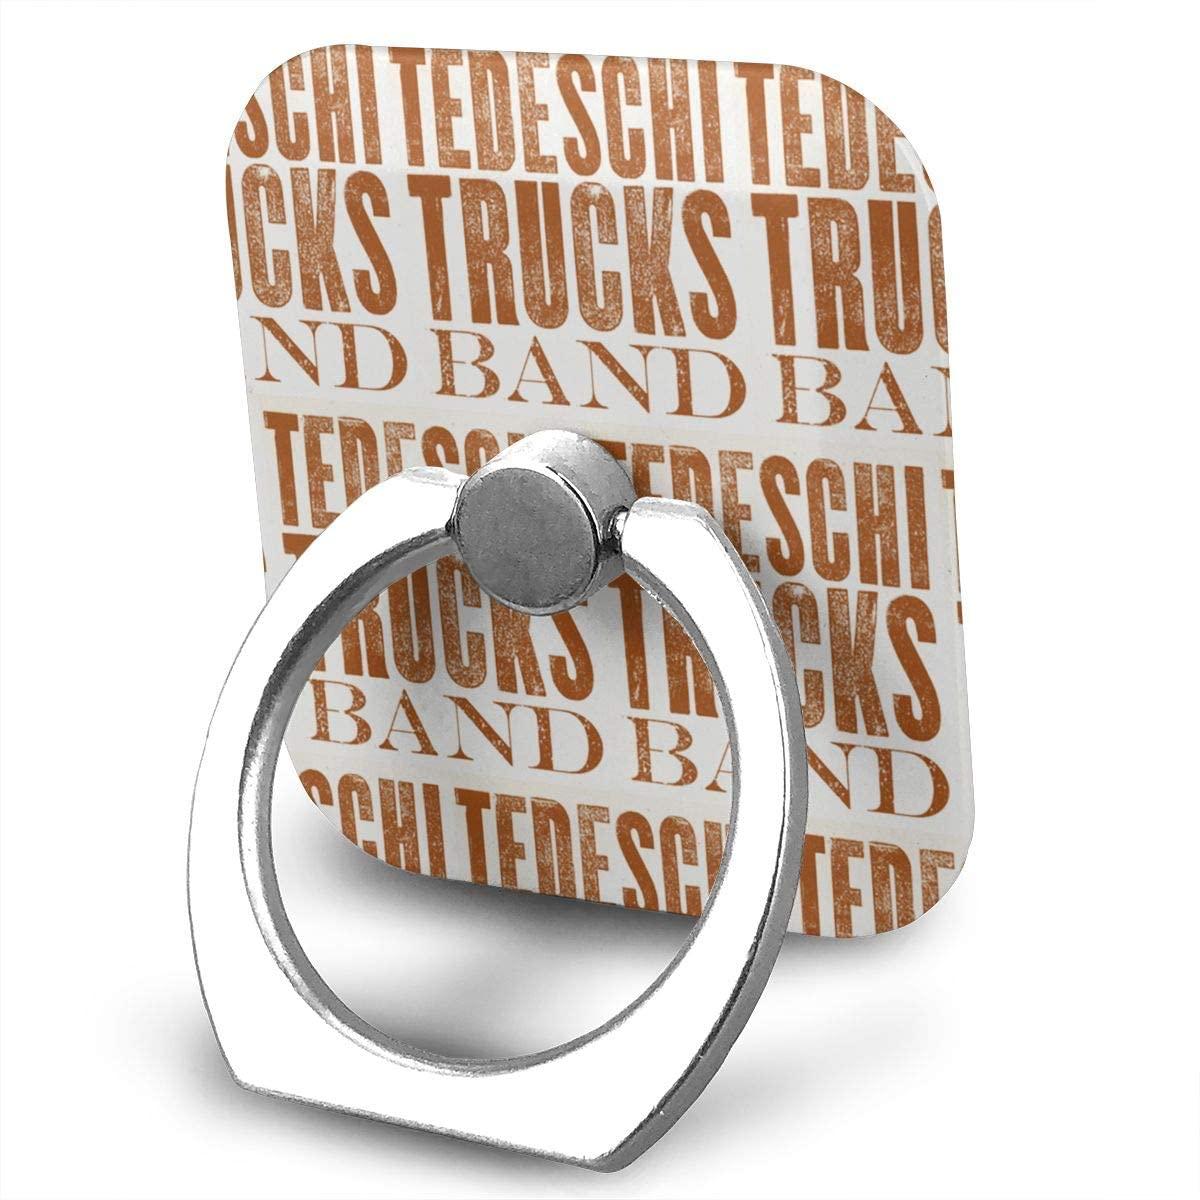 Tedeschi Trucks Band Phone Finger Ring Stand Bracket Holder Smartphone Grip Stand Holder 360 Degree Rotating Sticky Cute